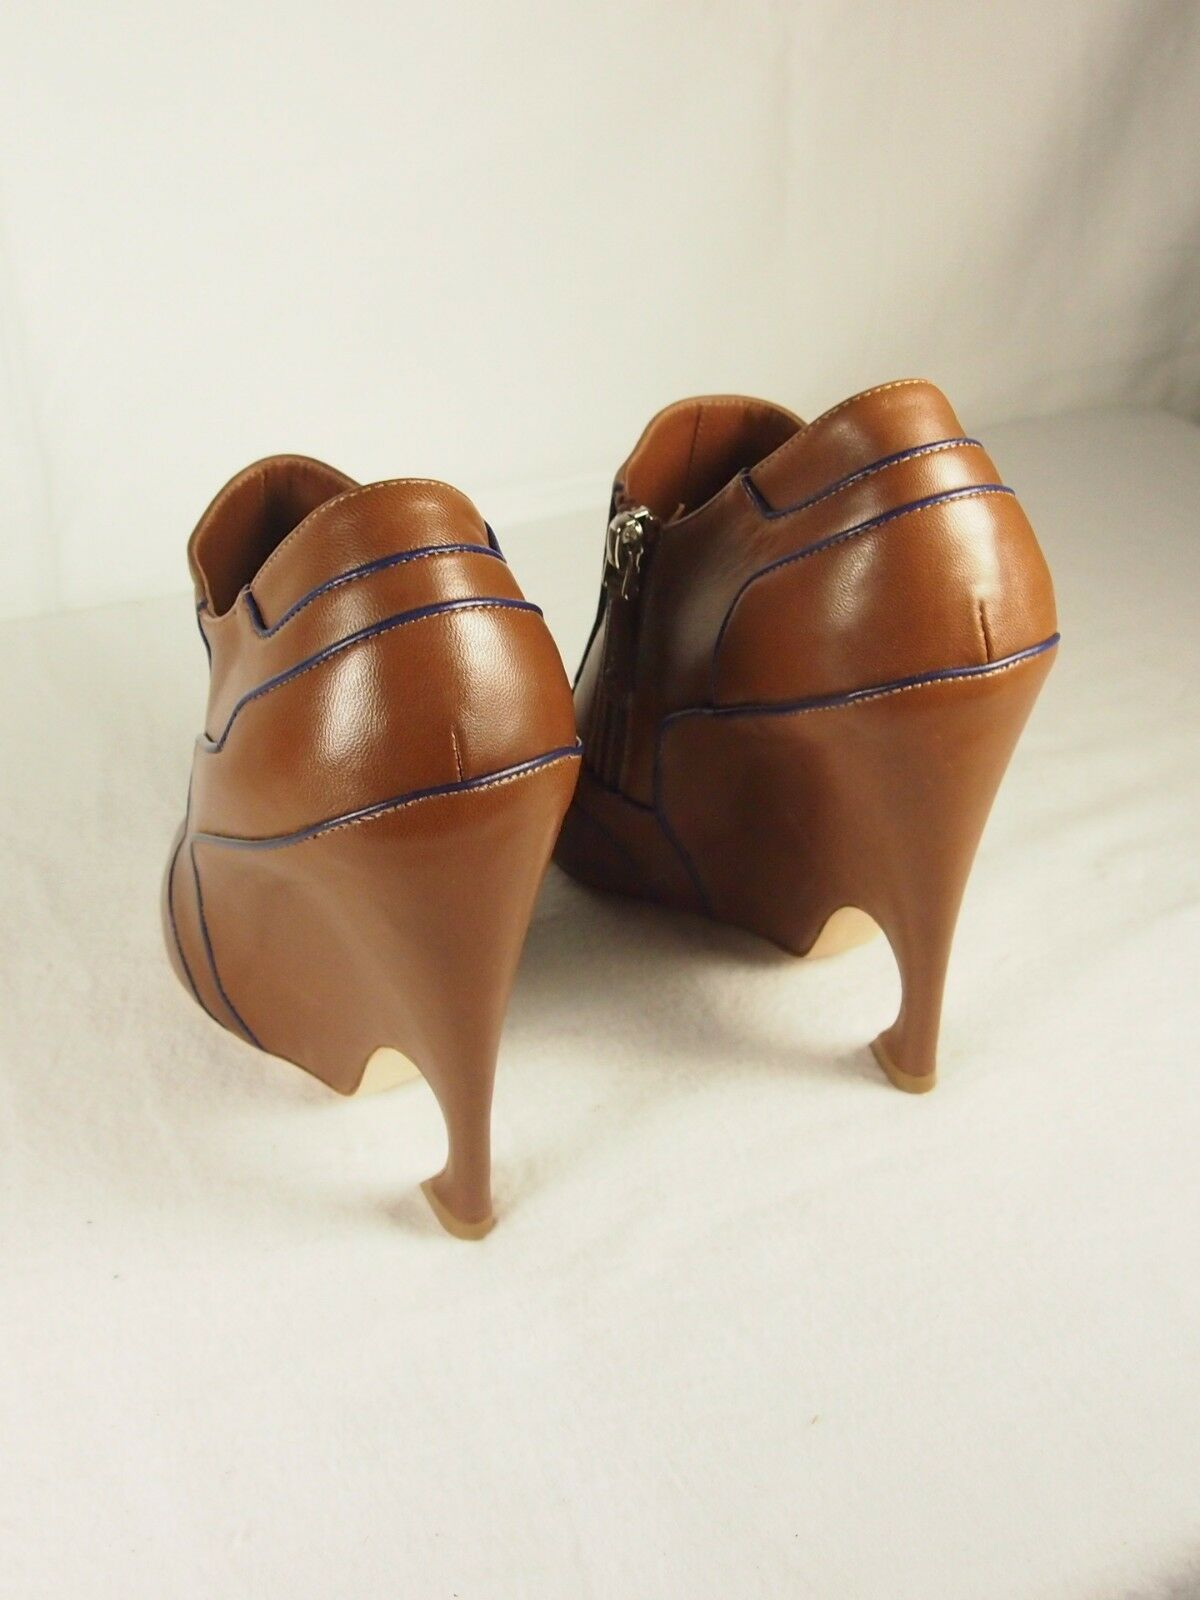 DIOR Chromatic shoes Bootie  Camel bluee bluee bluee Sz 39 Reg 1200.00 eac9b4